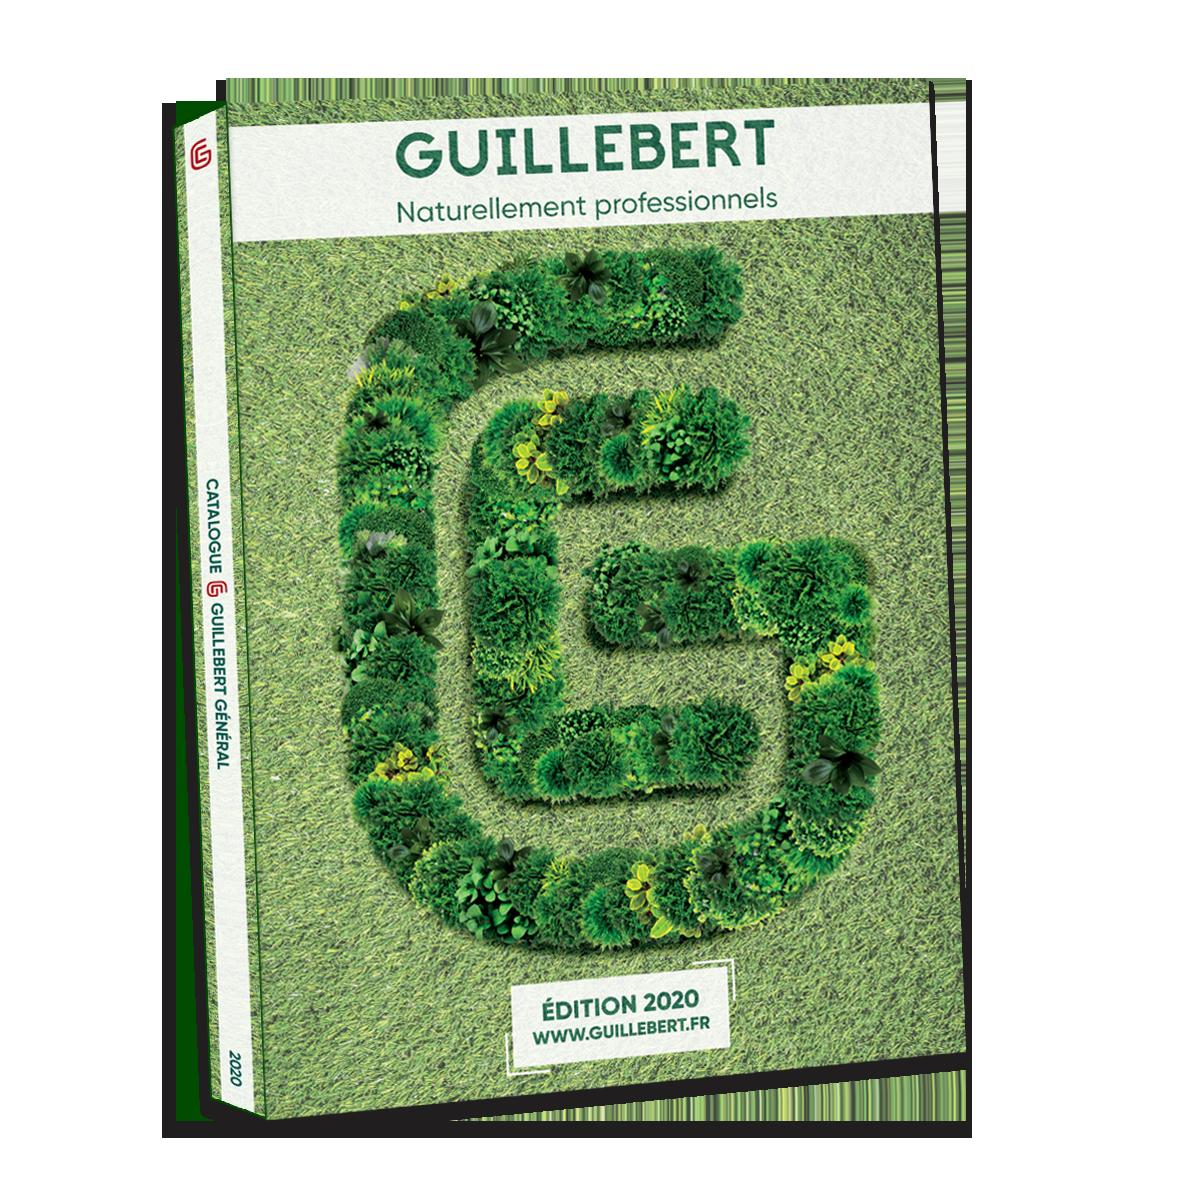 Catalogue général 2020 visual